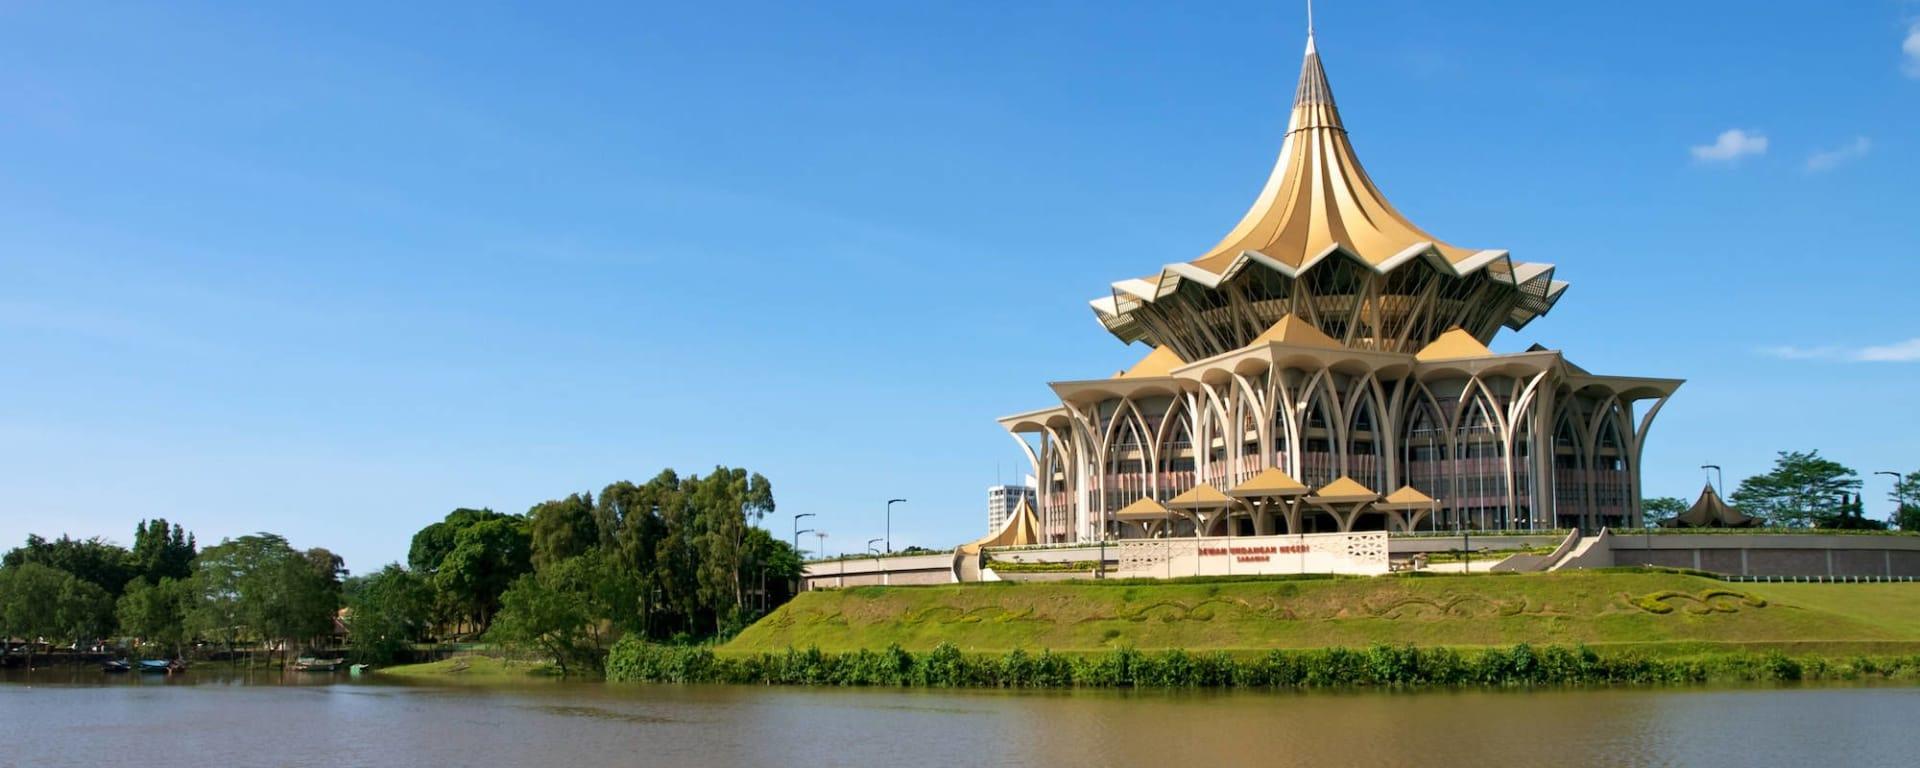 Tour de ville de Kuching: Kuching: Sarawak State Legislative Assembly (Dewan Undangan Negeri) building